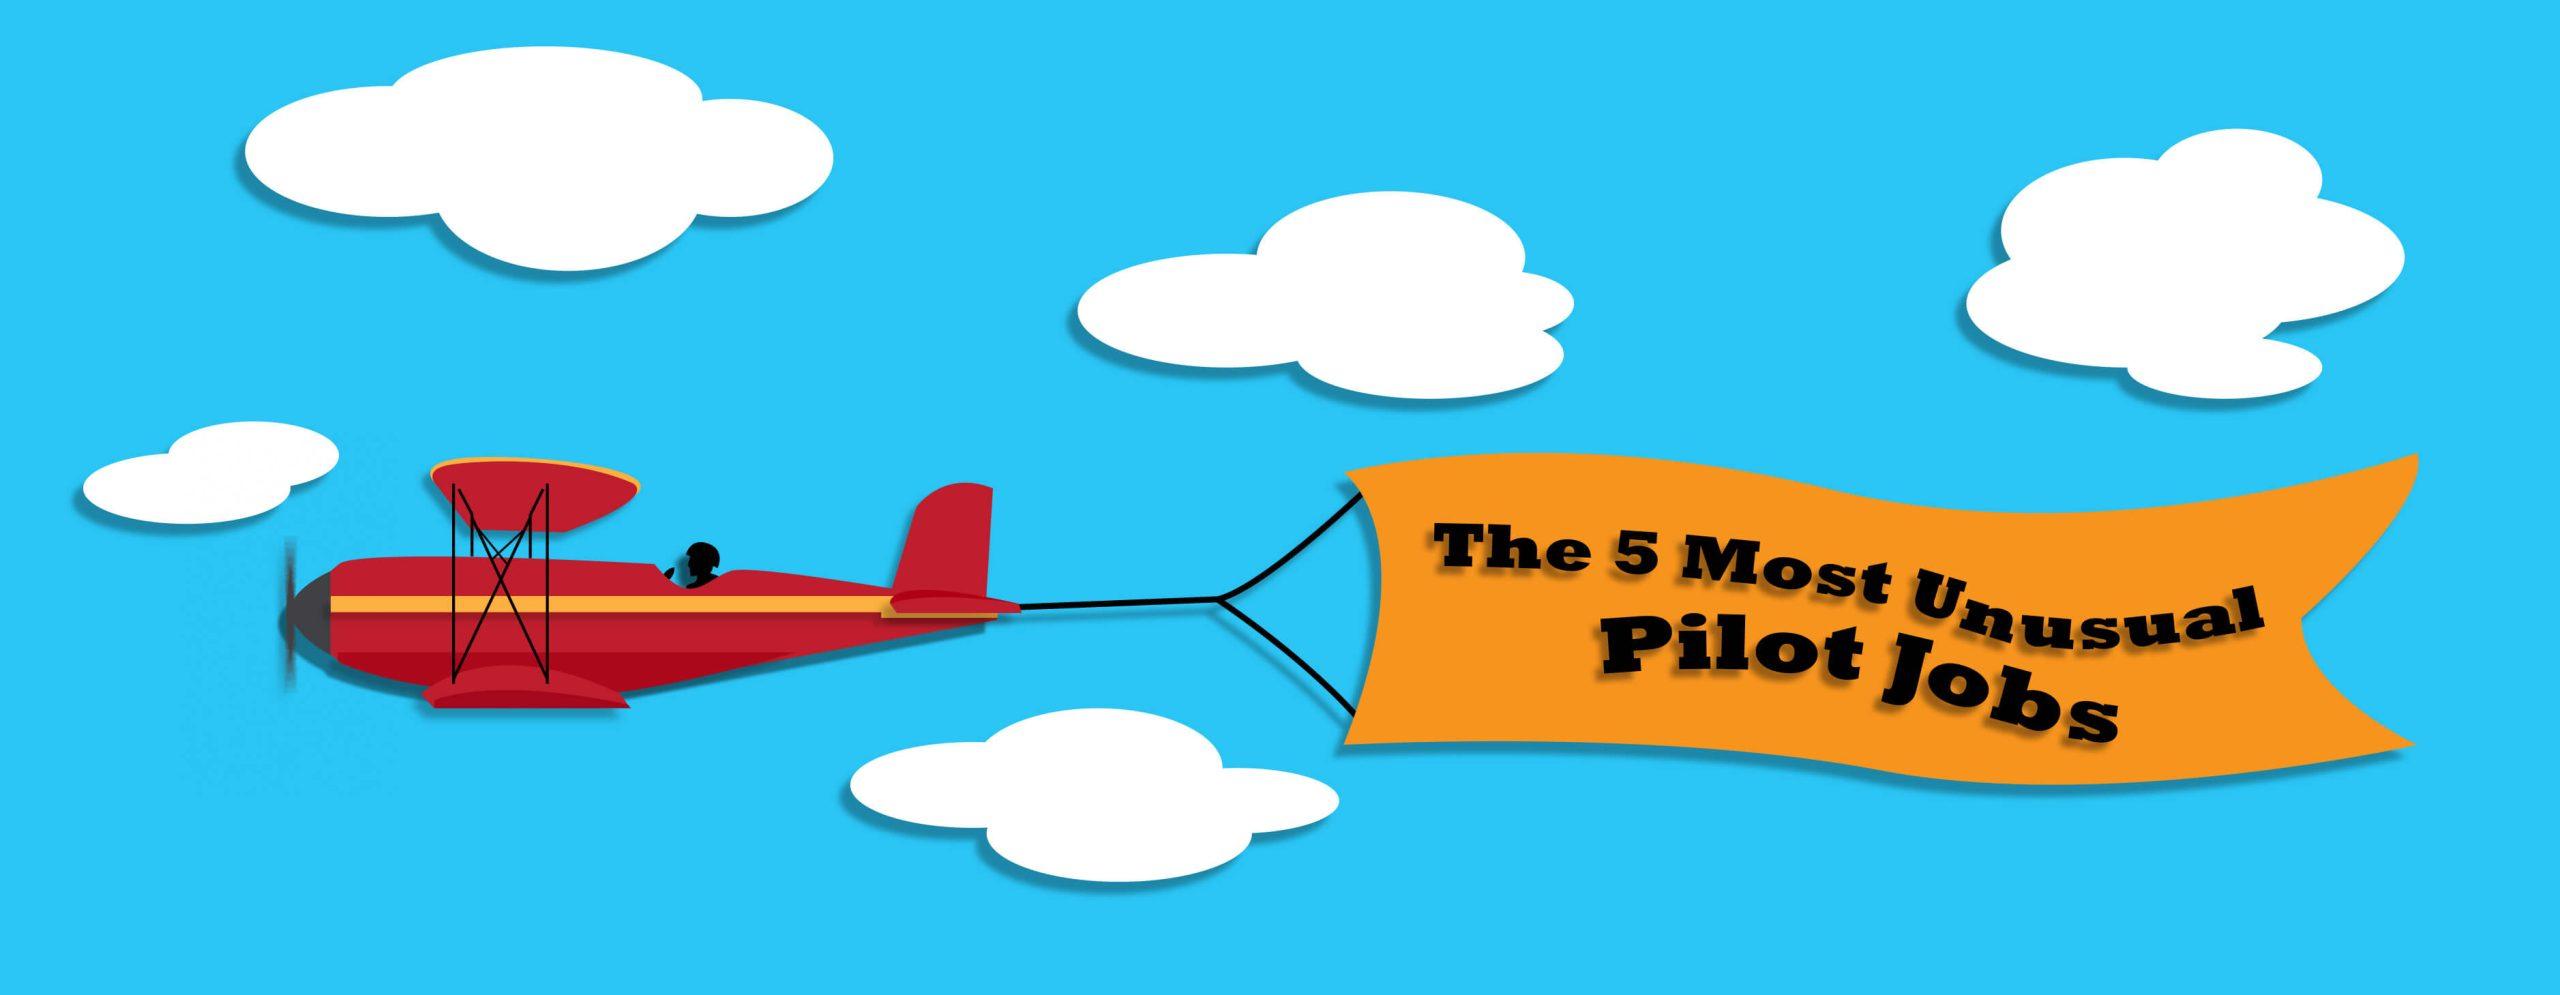 Five Unusual Pilot Jobs